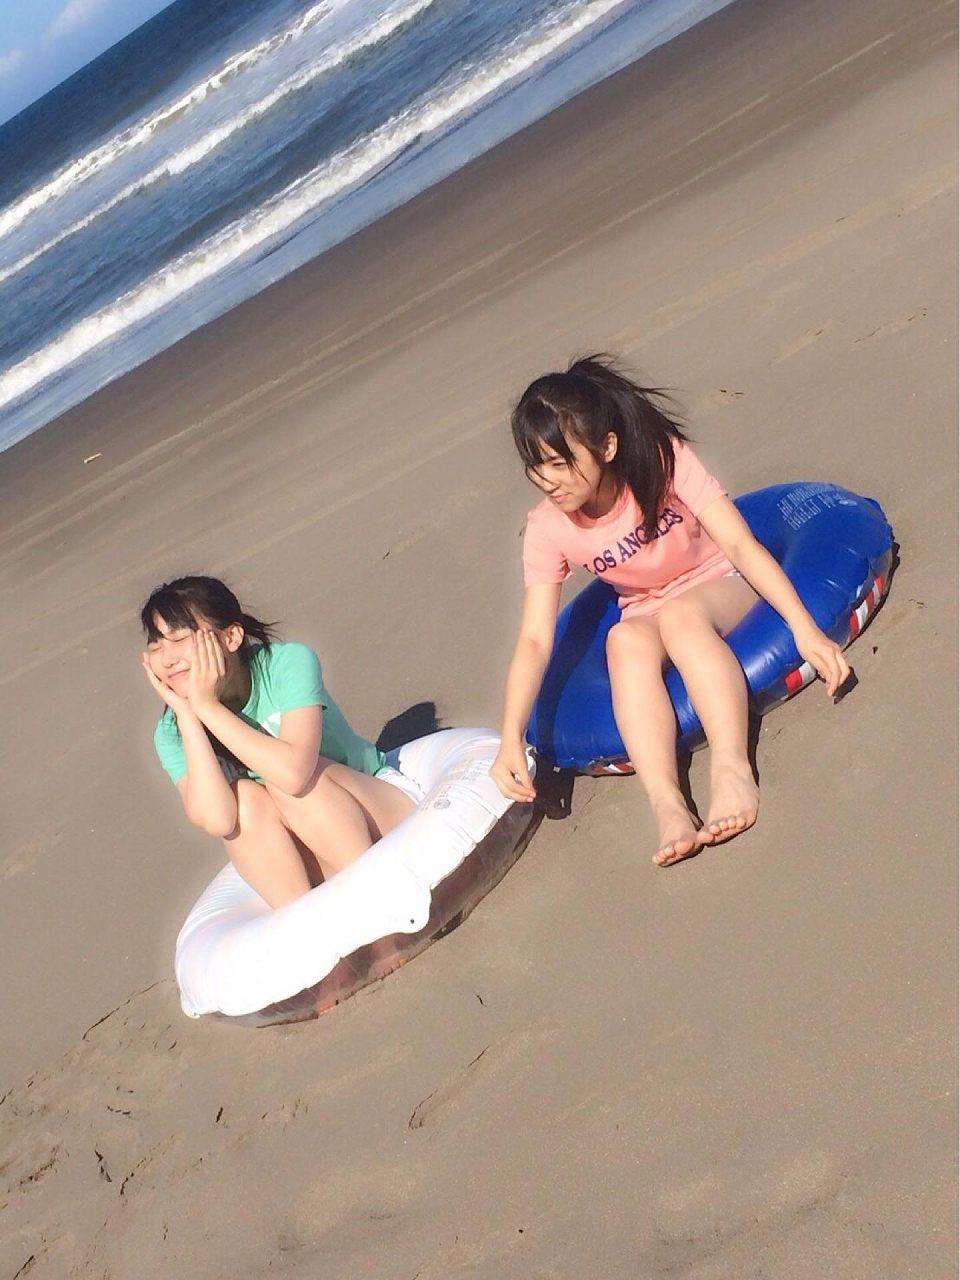 HKT48の矢吹奈子と田中美久の漫画アクショングラビアオフショット